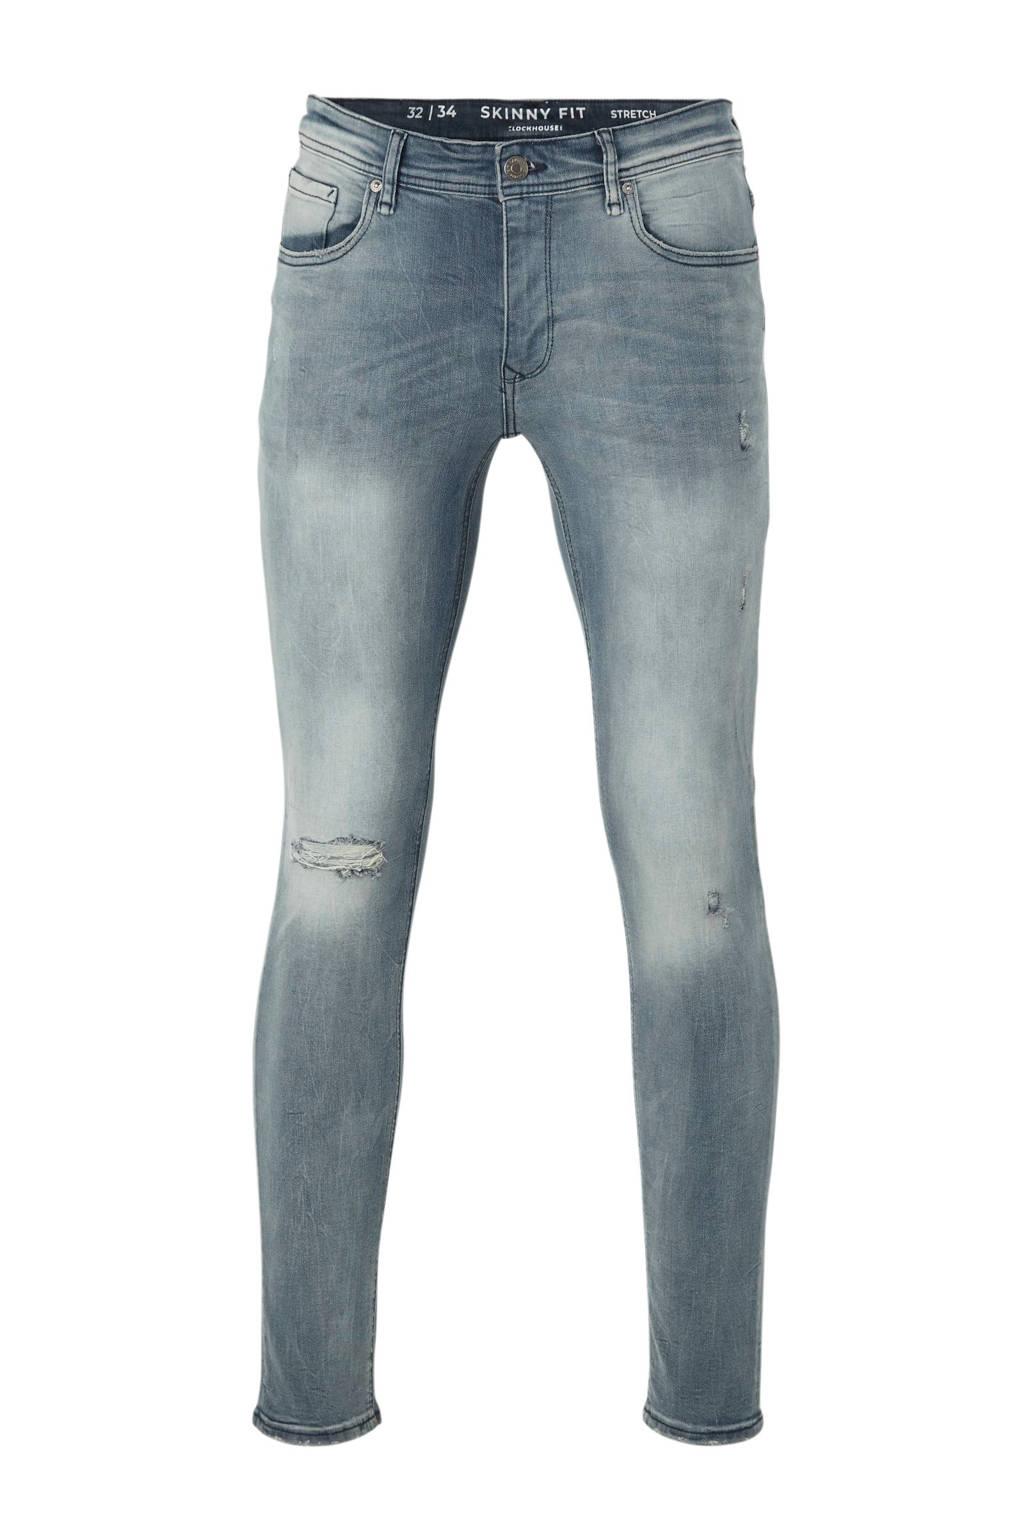 C&A slim fit jeans light denim, Light denim